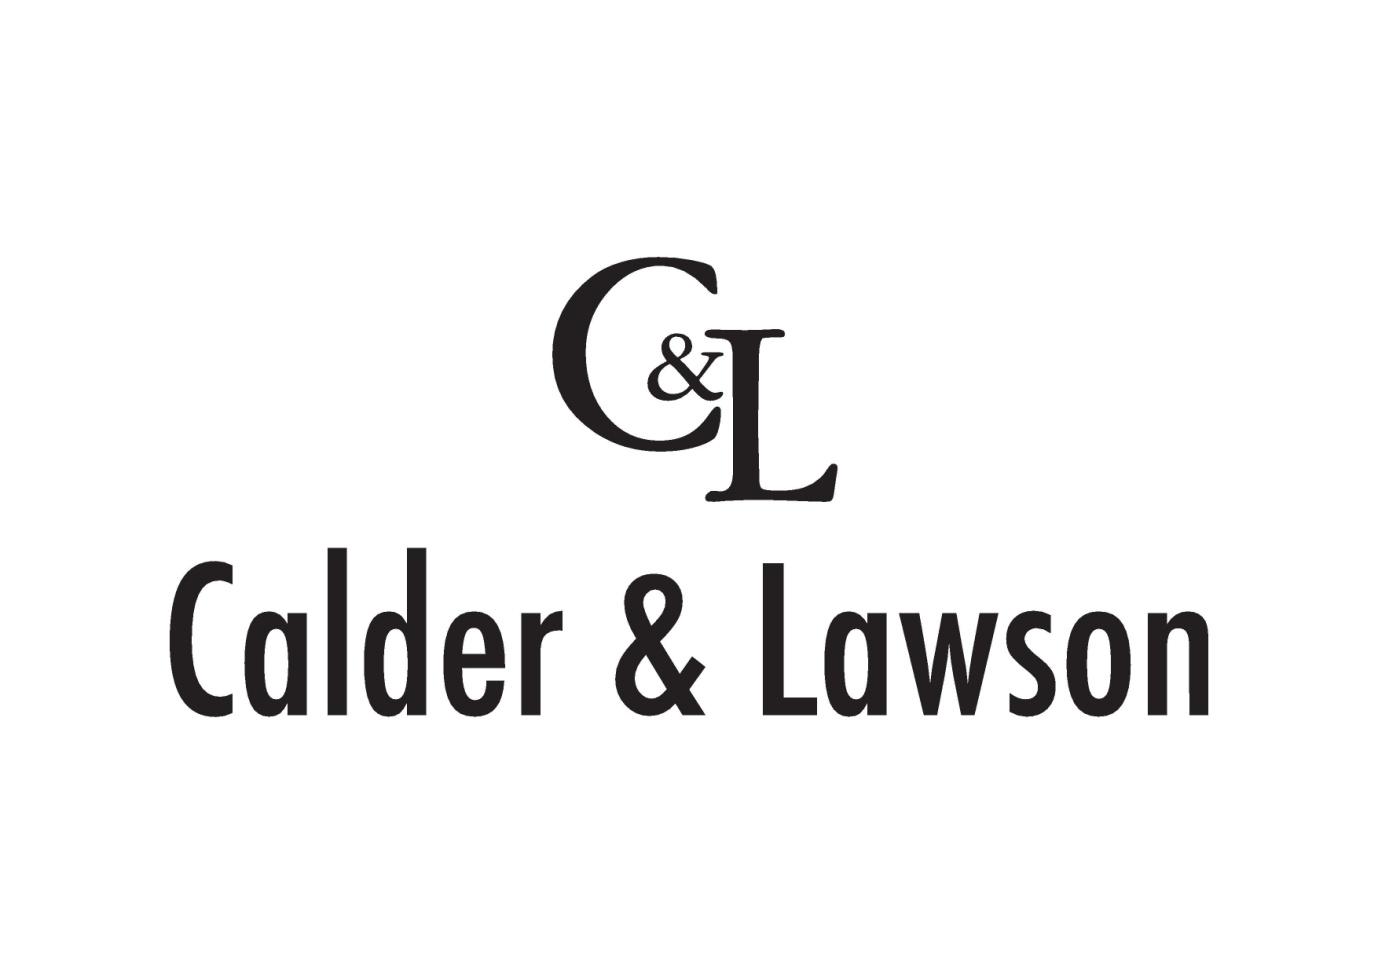 Calder and Lawson.jpg